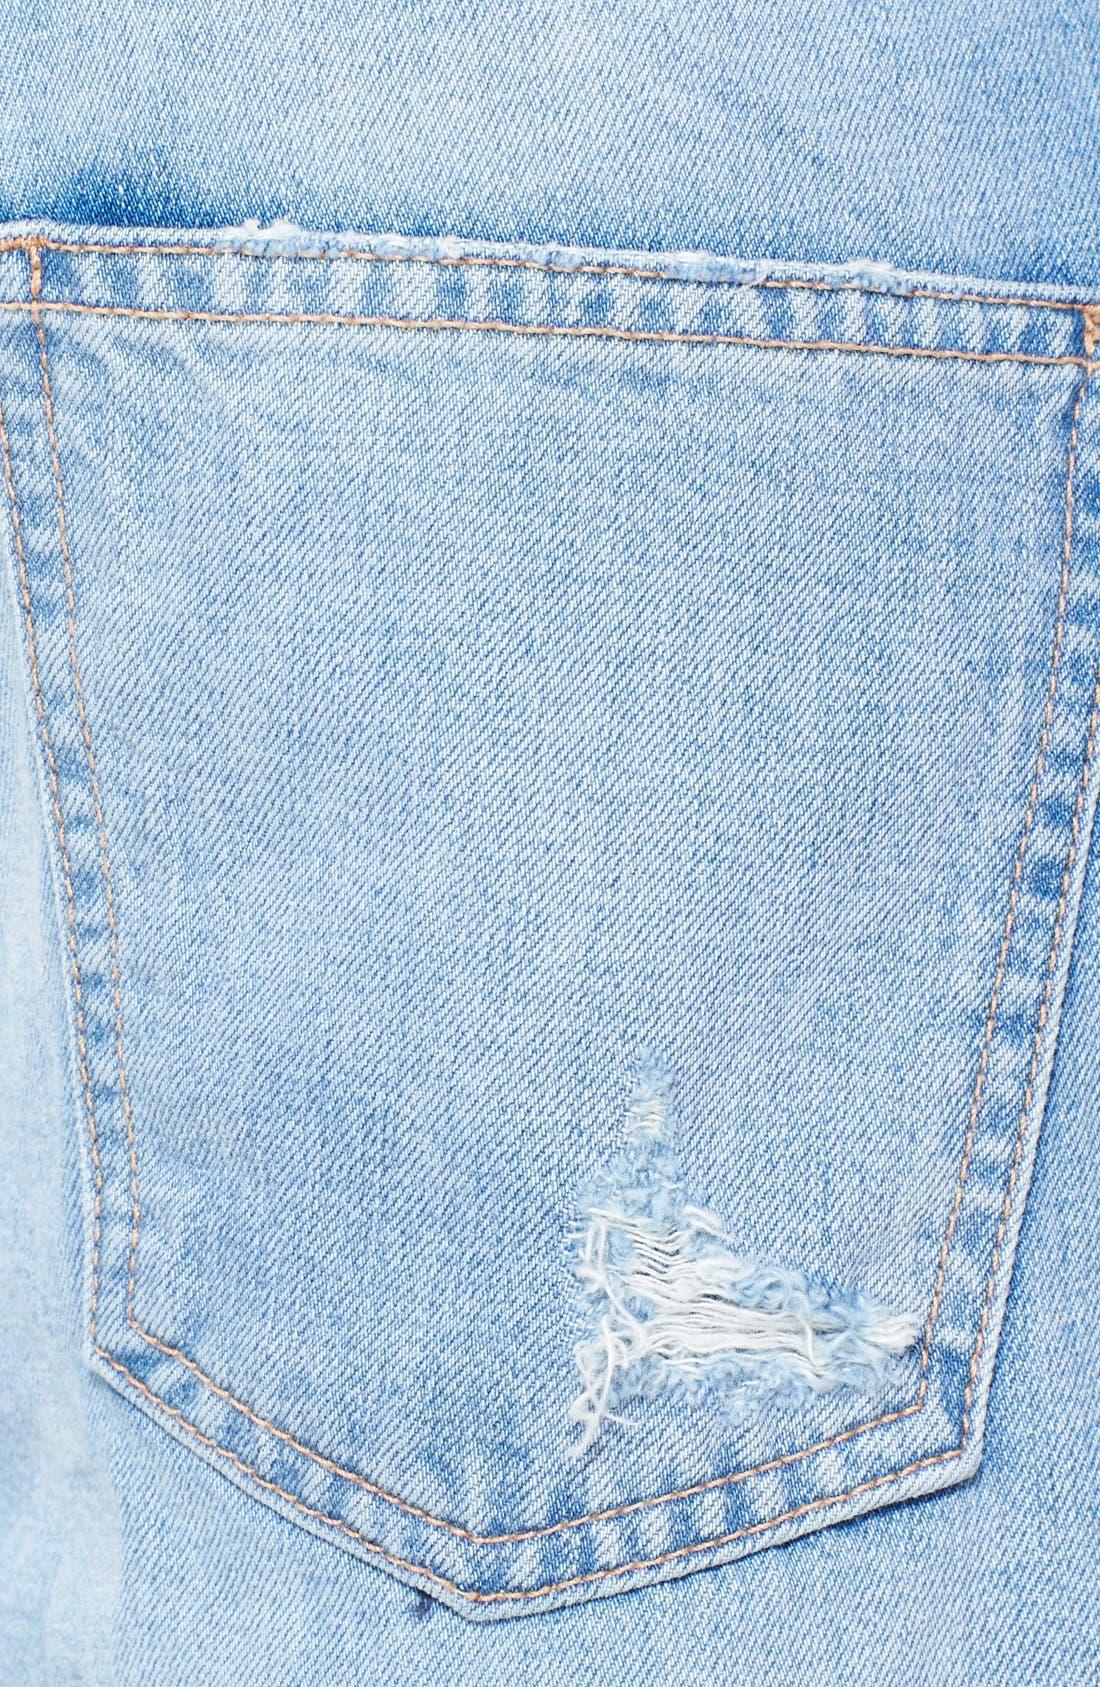 Alternate Image 3  - Current/Elliott 'The Fling' Destroyed Crop Jeans (Kasey with Repair)